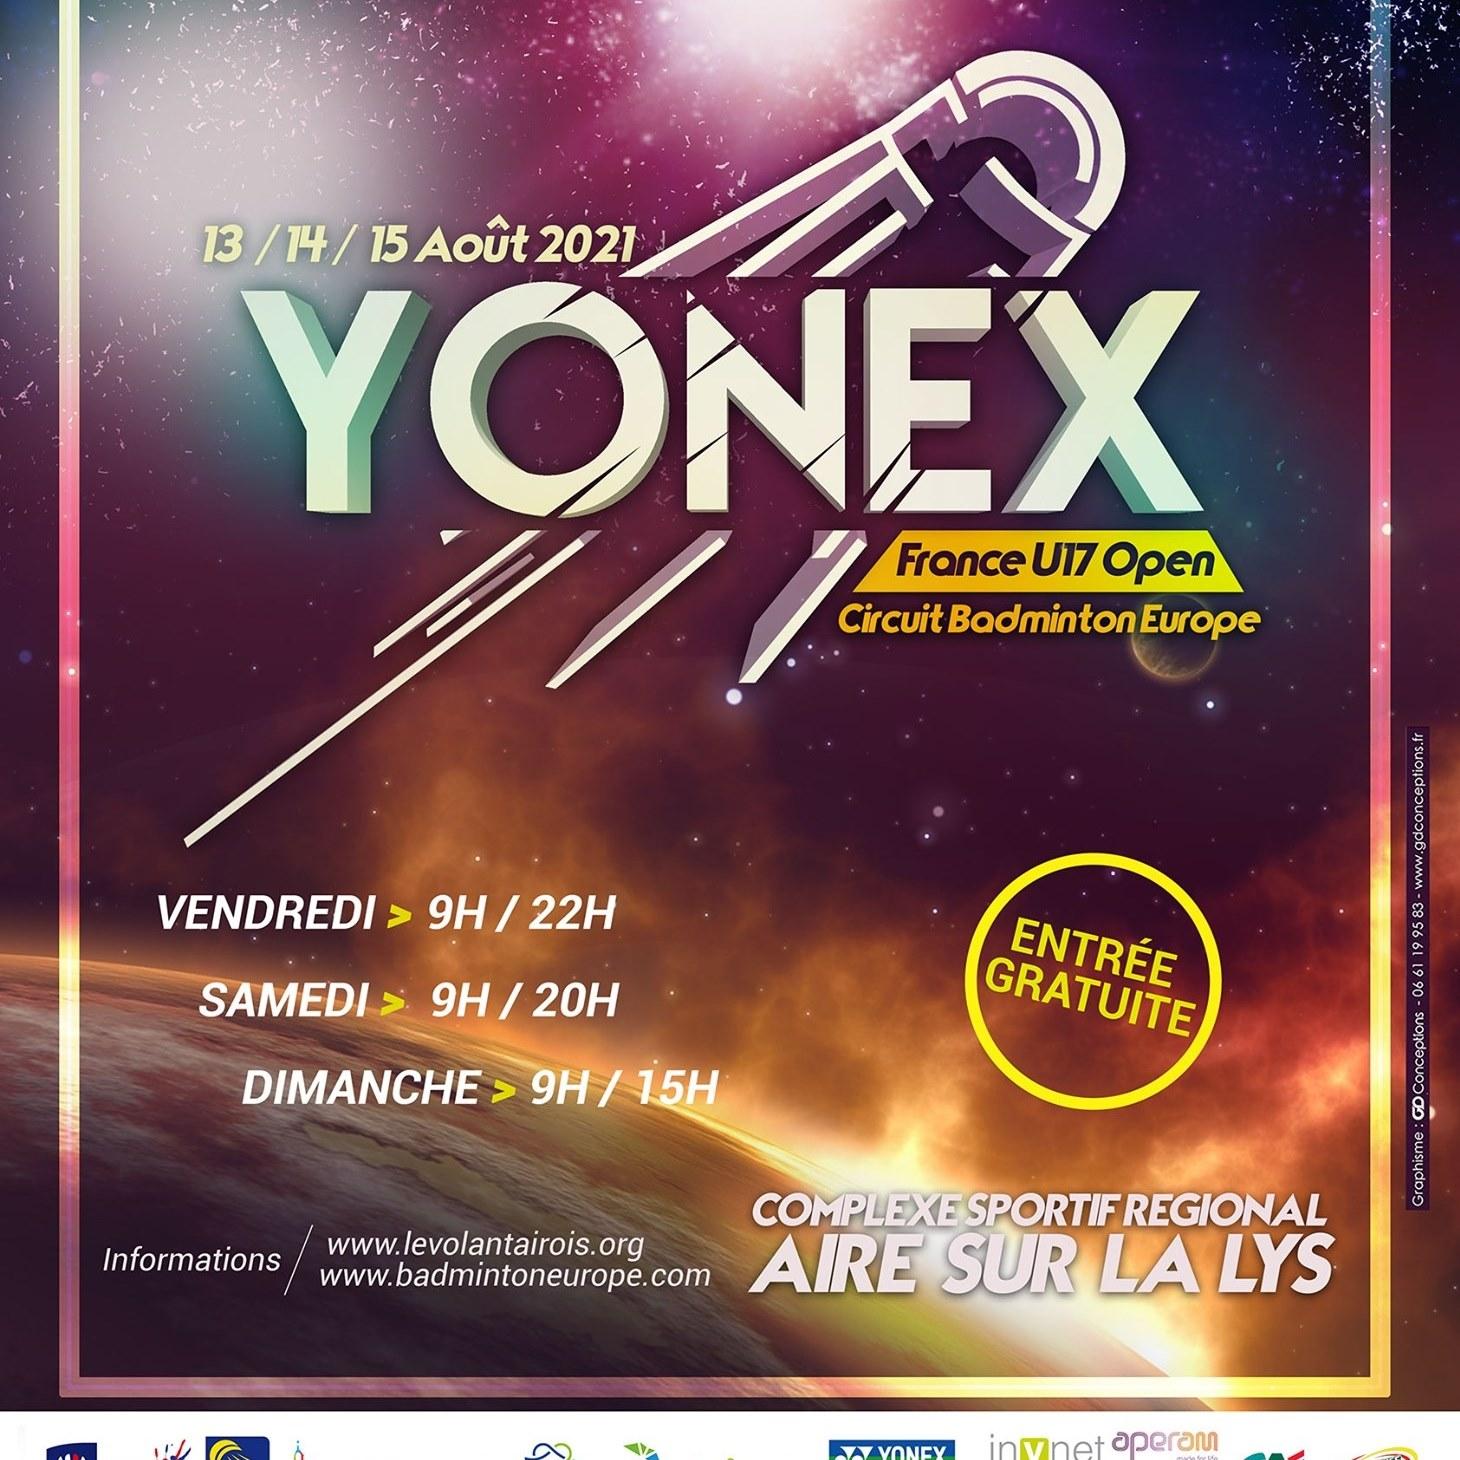 https://www.lifb.org/wp-content/uploads/2021/08/Yonex-Open-France-U17.jpg